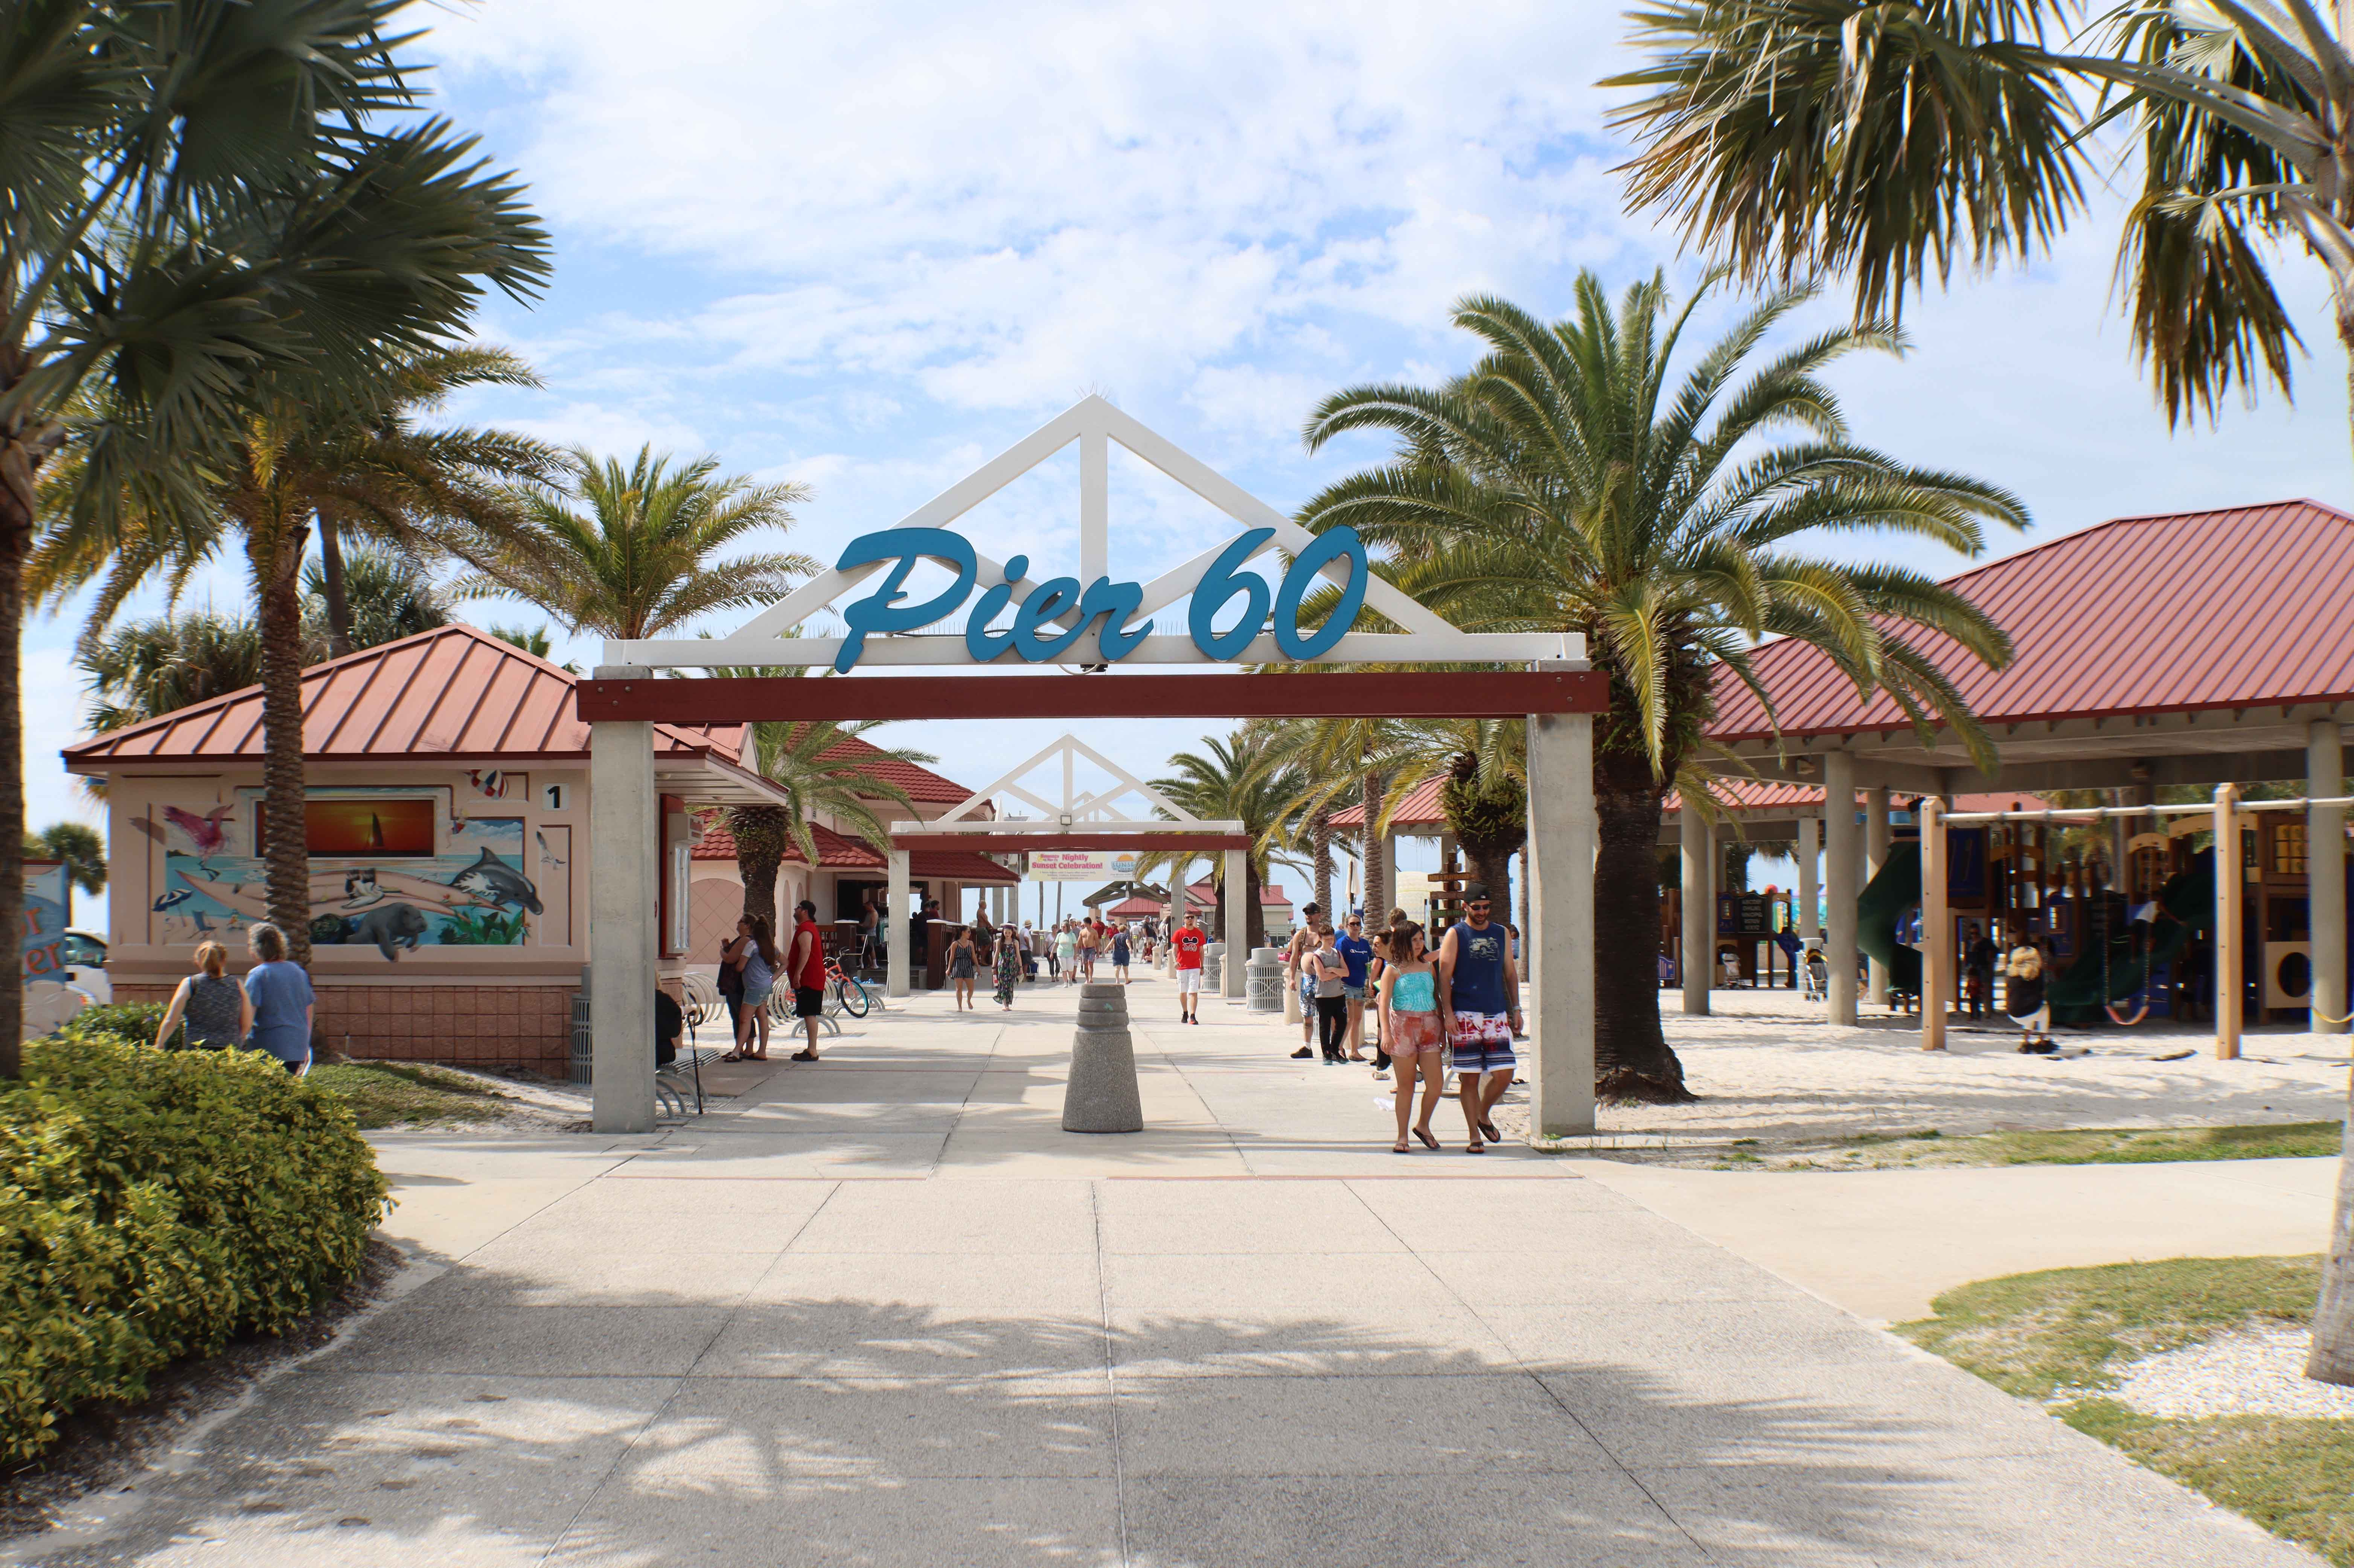 Sun-West-Palms-202A-Clearwater-Beach-Florida-Condo-Rental